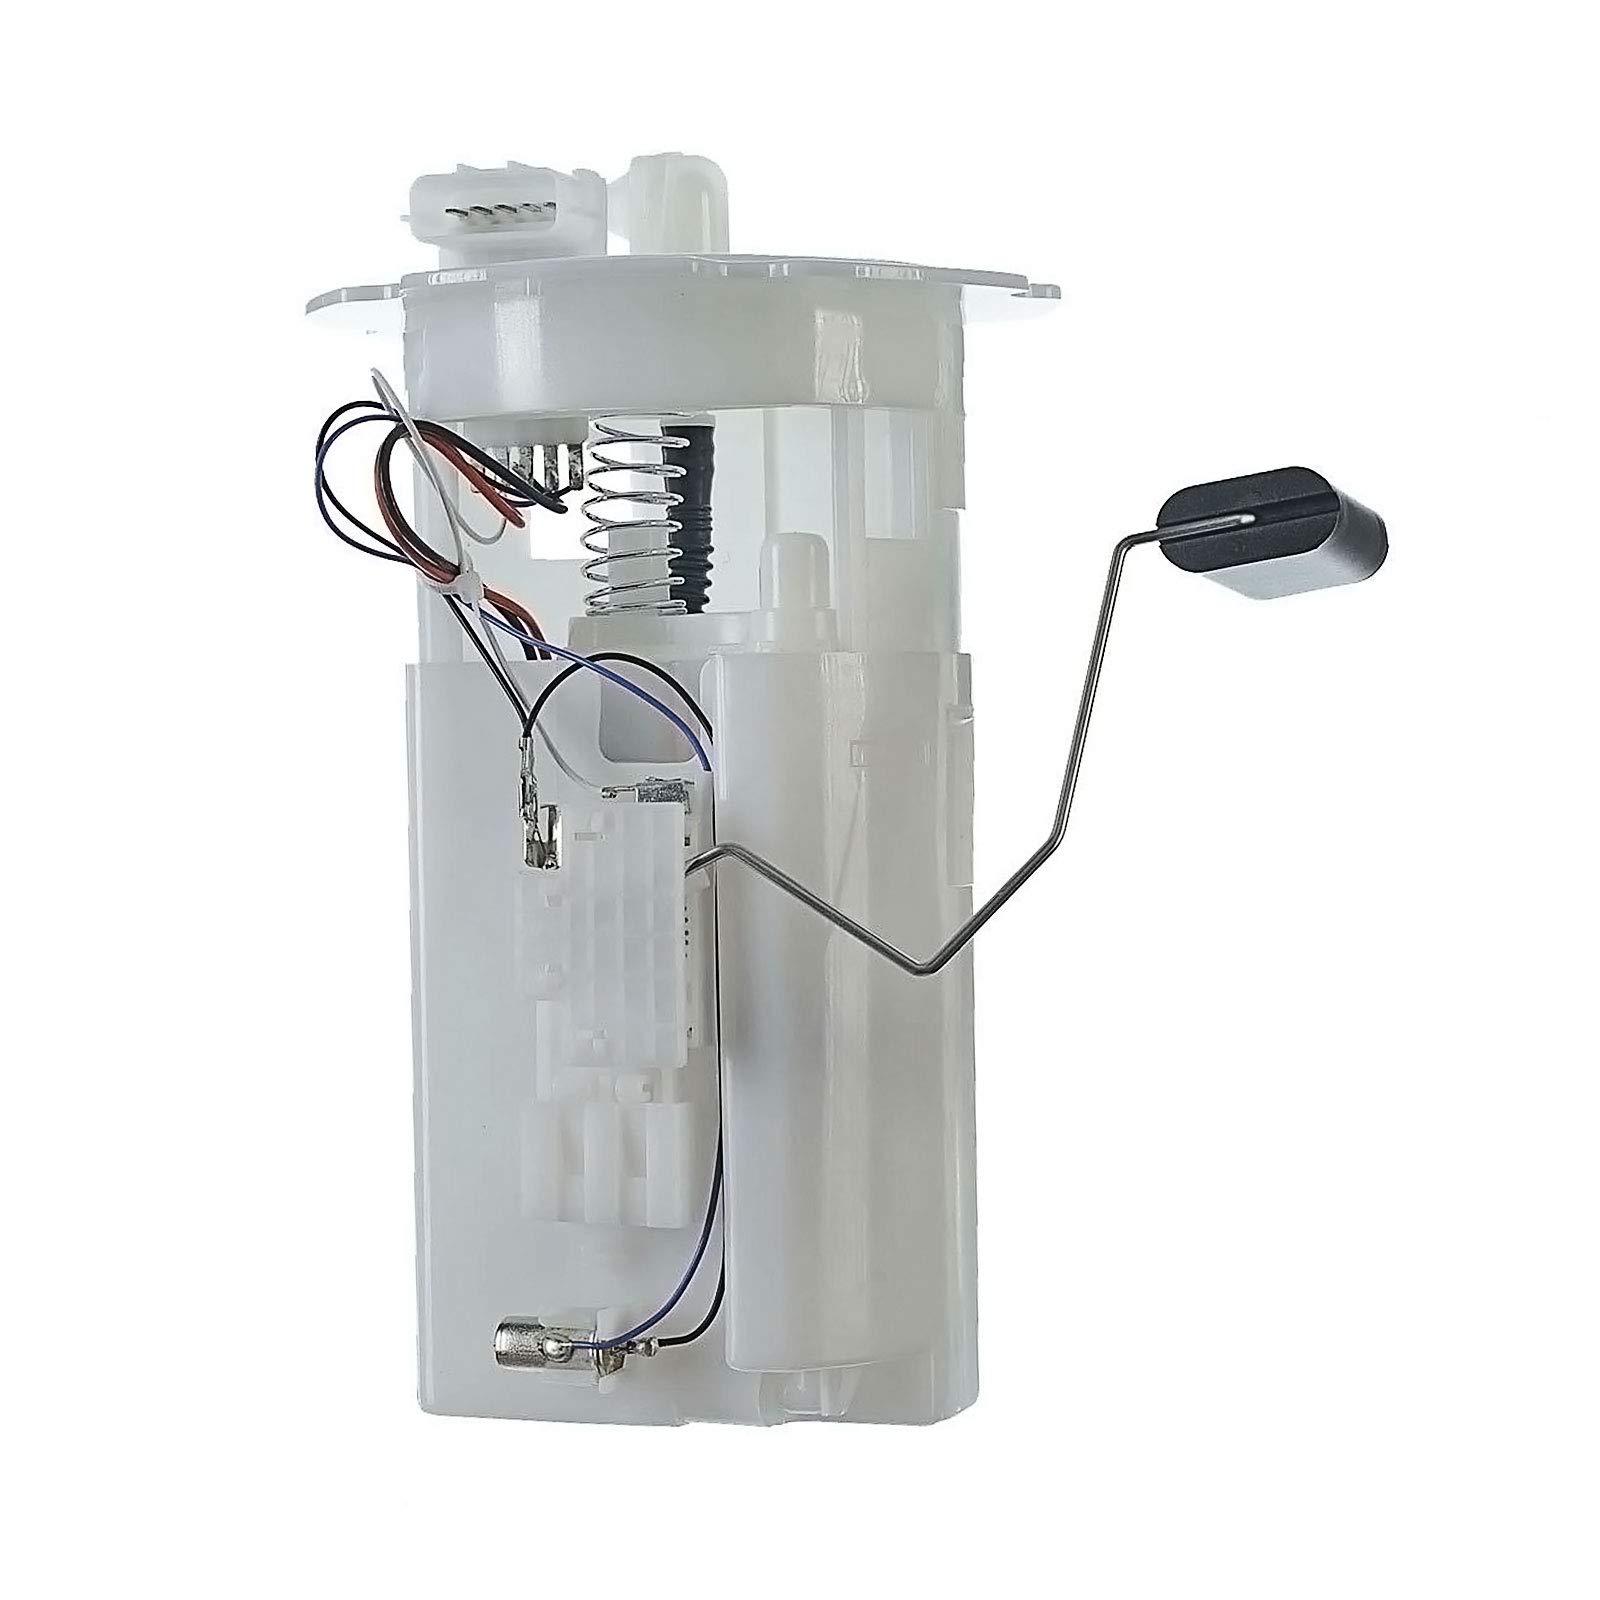 A-Premium Electric Fuel Pump Module Assembly Compatible with Nissan Altima 2004-2006 2.5L 3.5L California